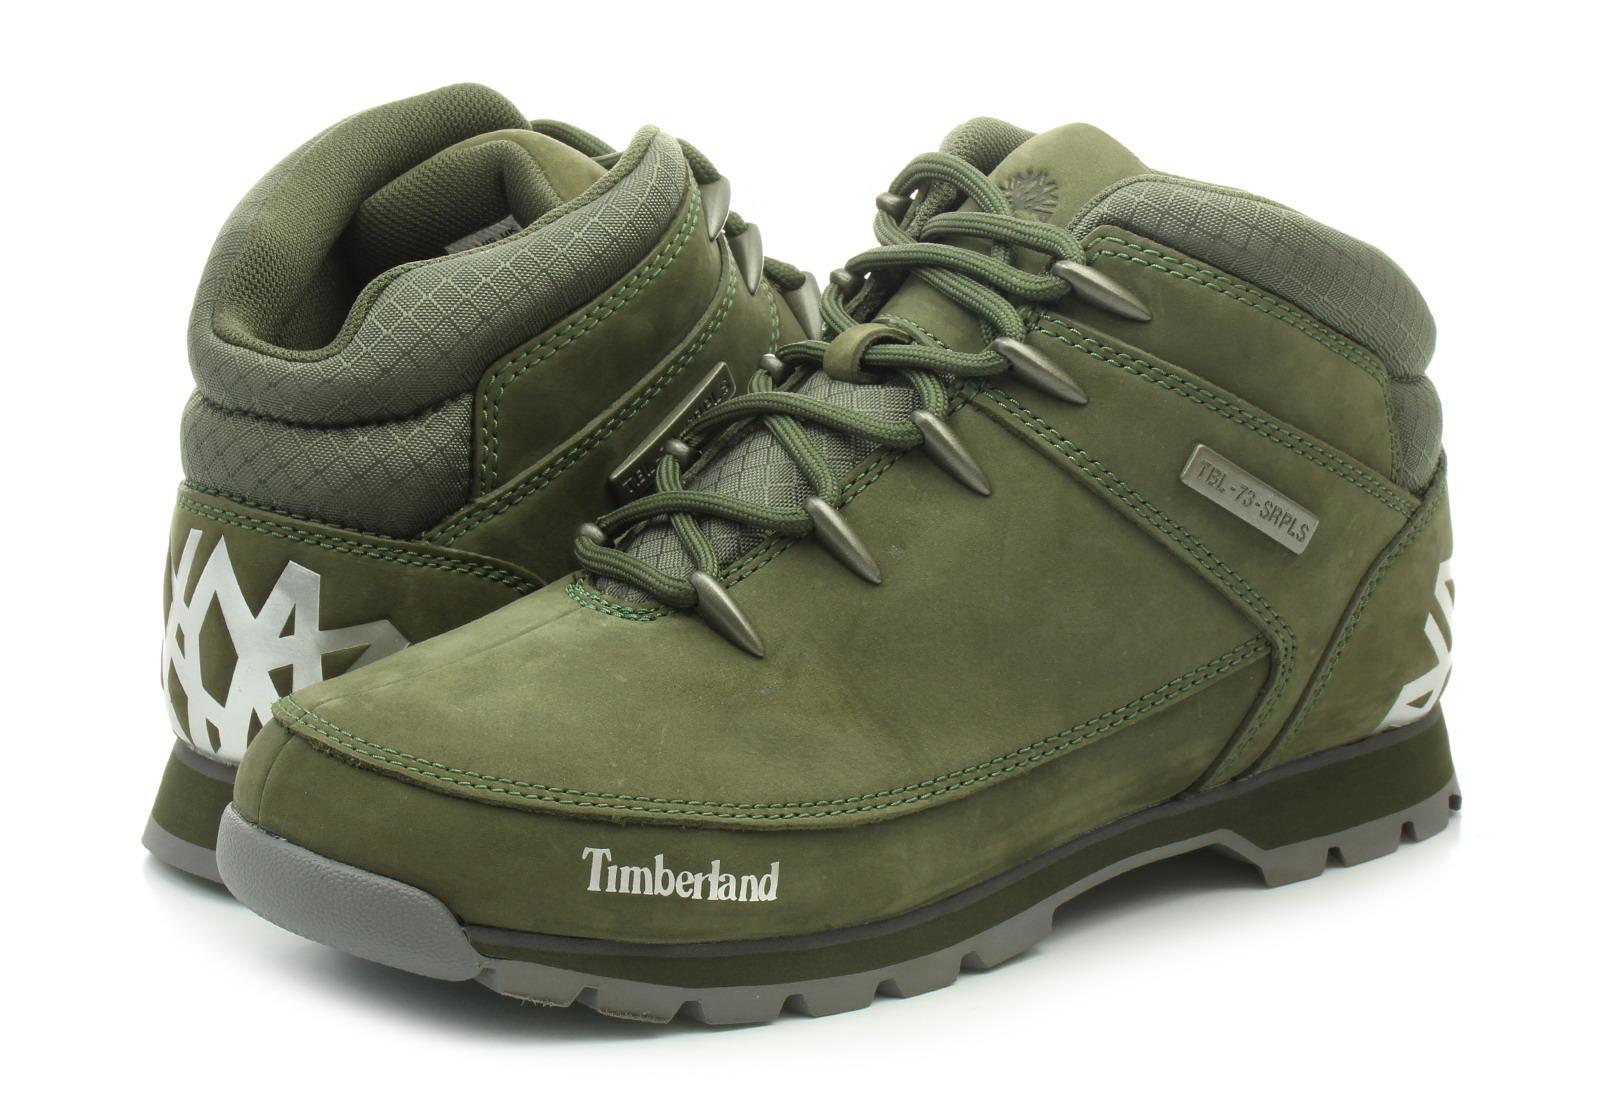 Timberland Topánky - Euro Sprint Hiker - A1VR9-grn - Tenisky ... 1aece58af92